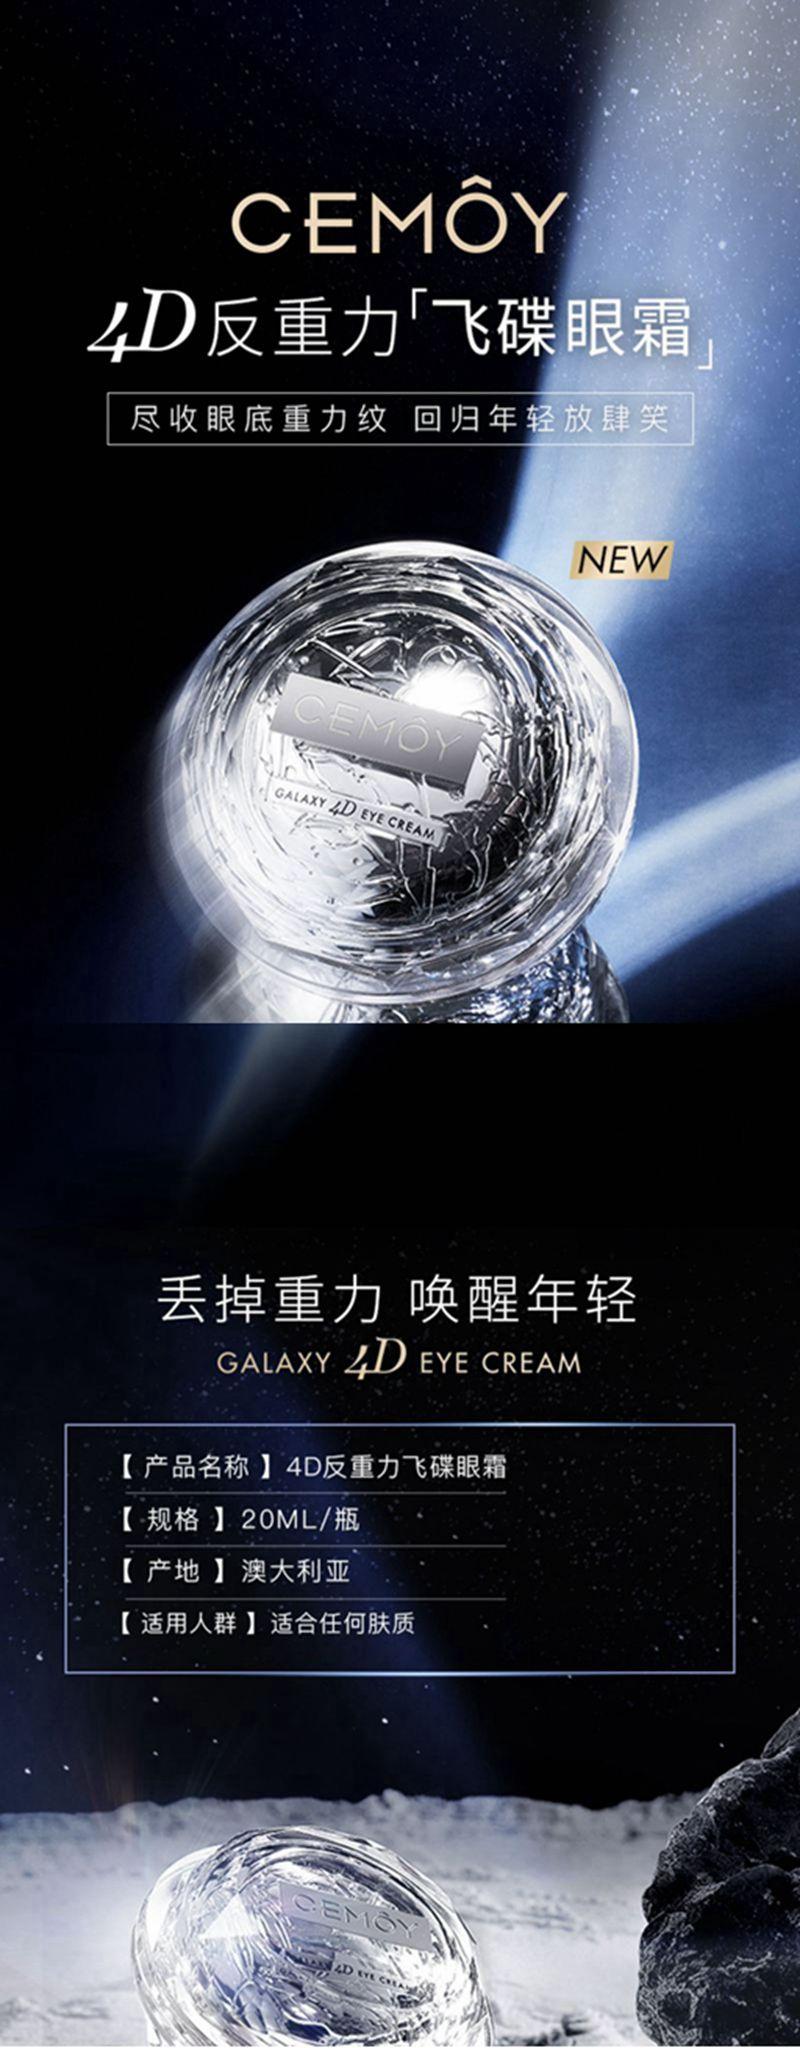 Cemoy4D反重力飞碟眼霜带走重力纹 信息